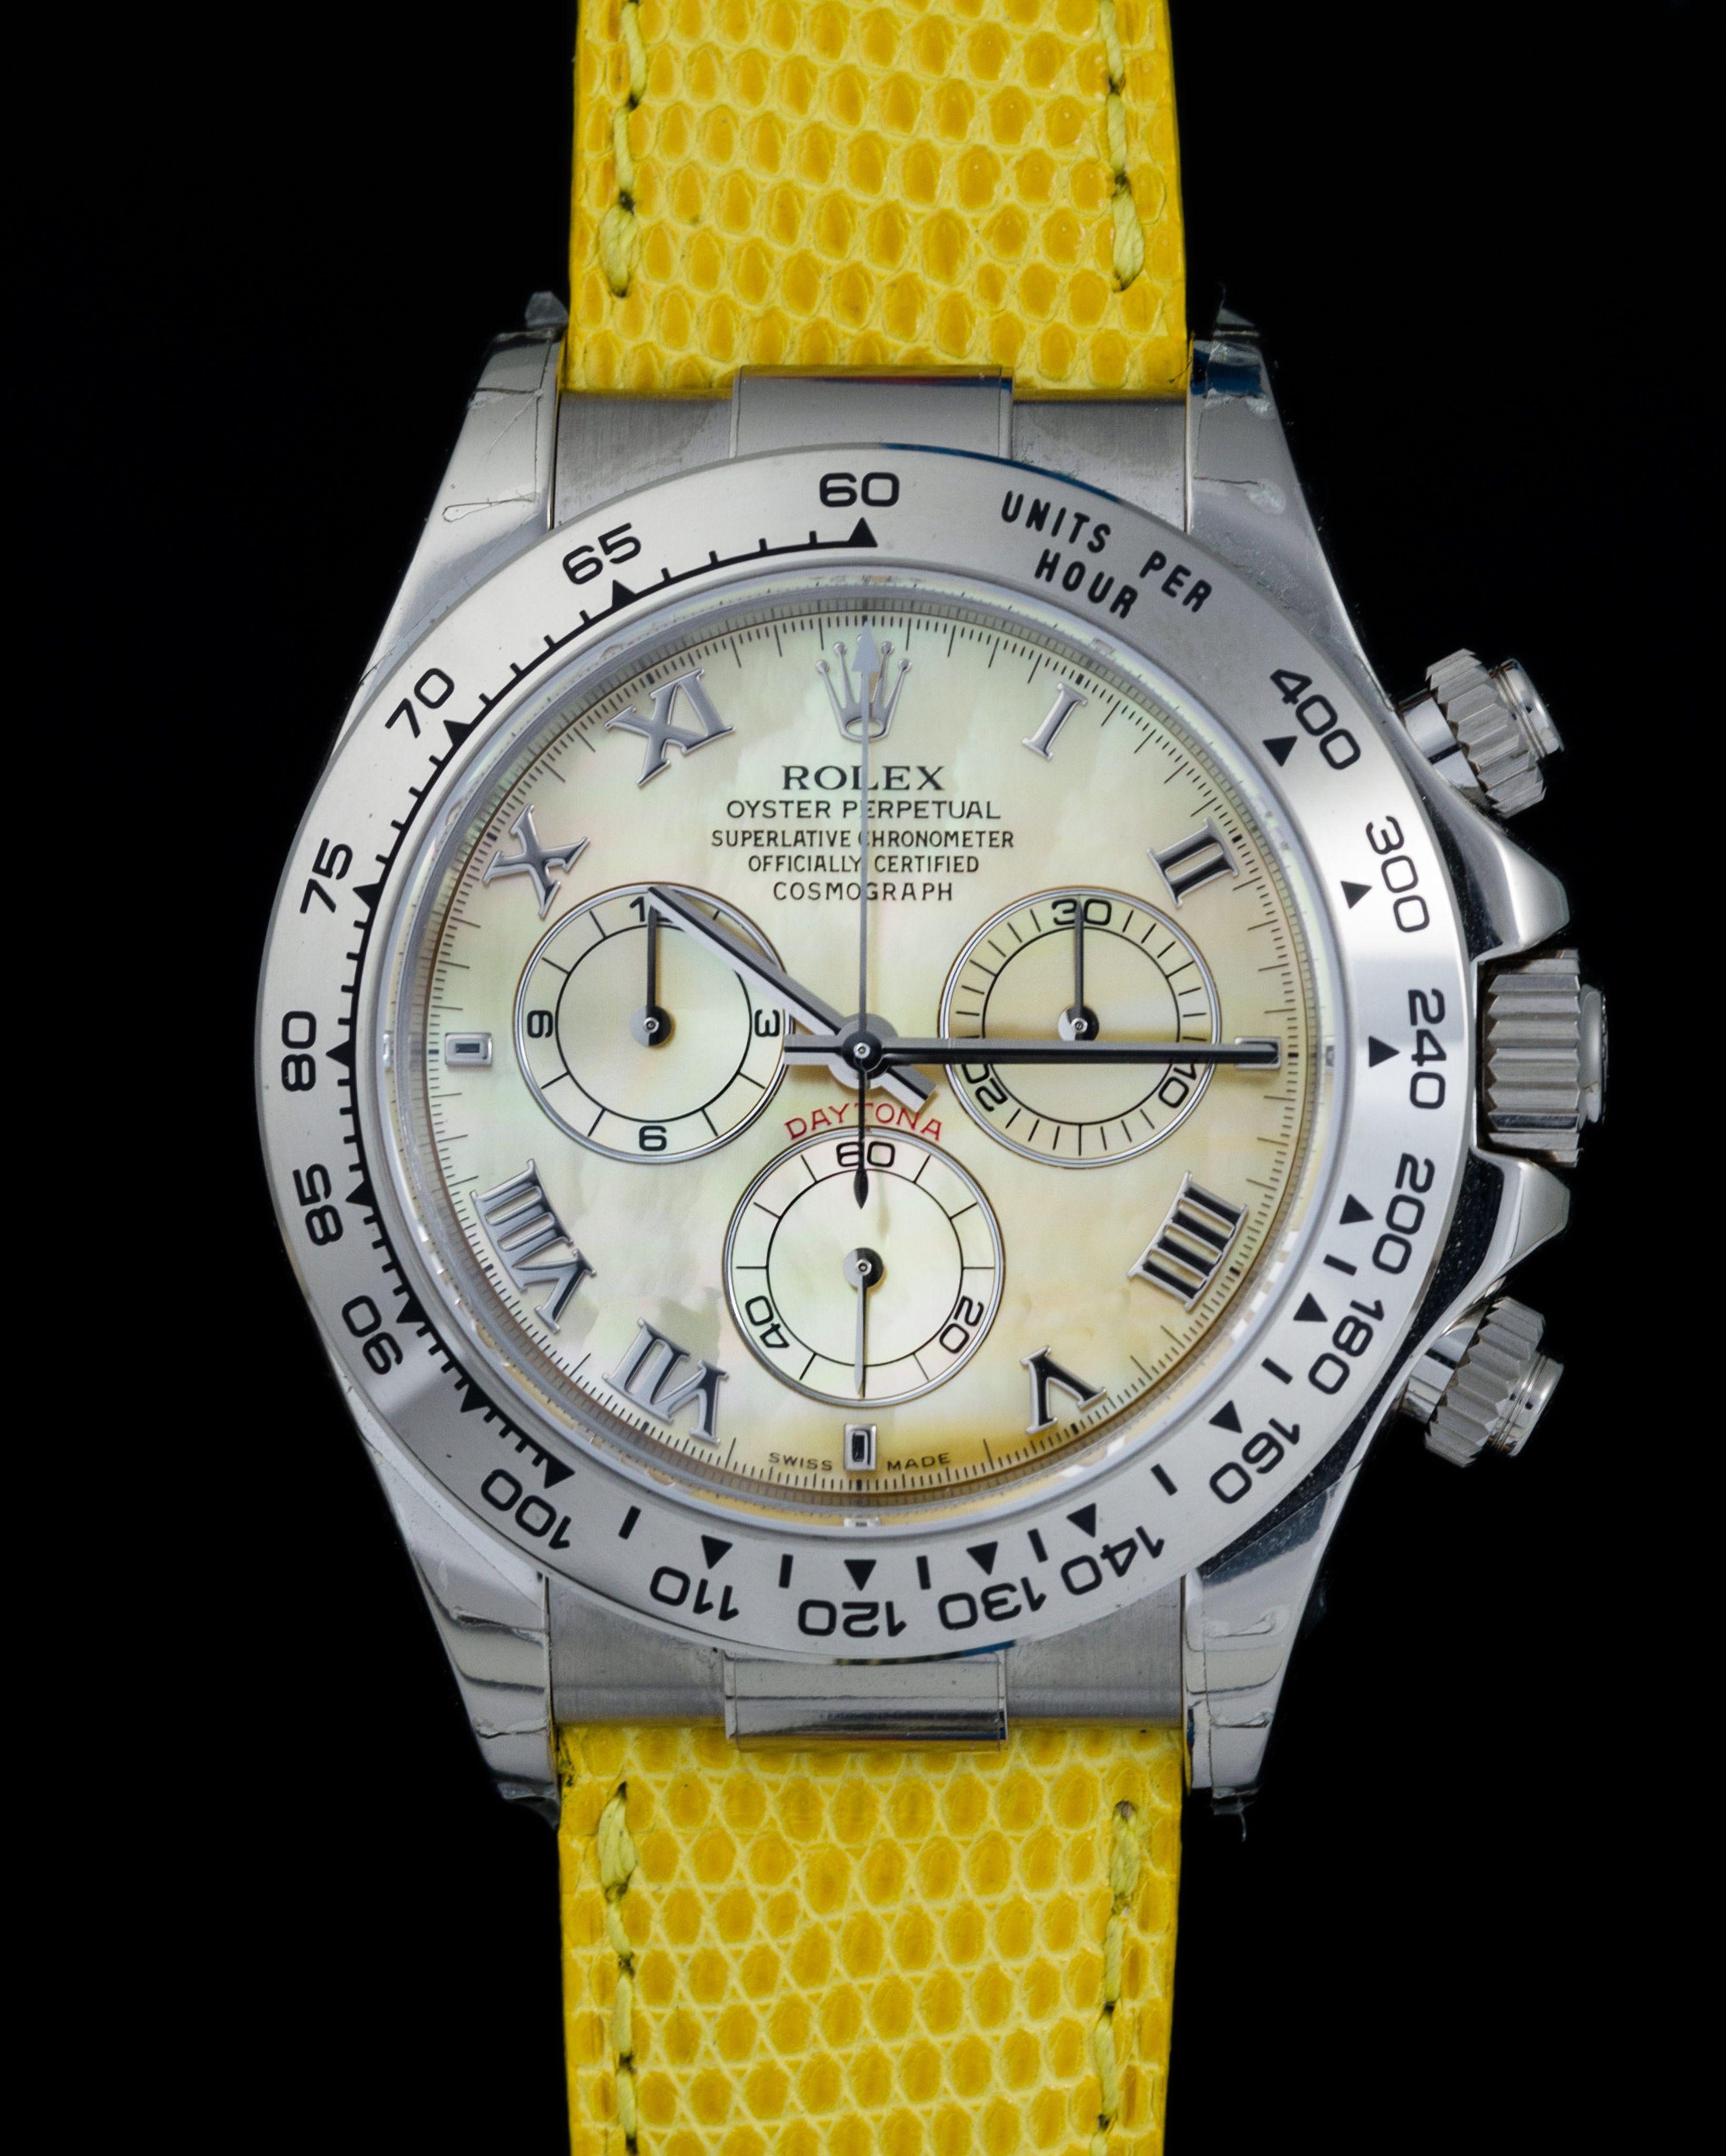 Rolex 116519 Daytona Beach Yellow 18kt W Gold Vintage Watches Milano Orologio